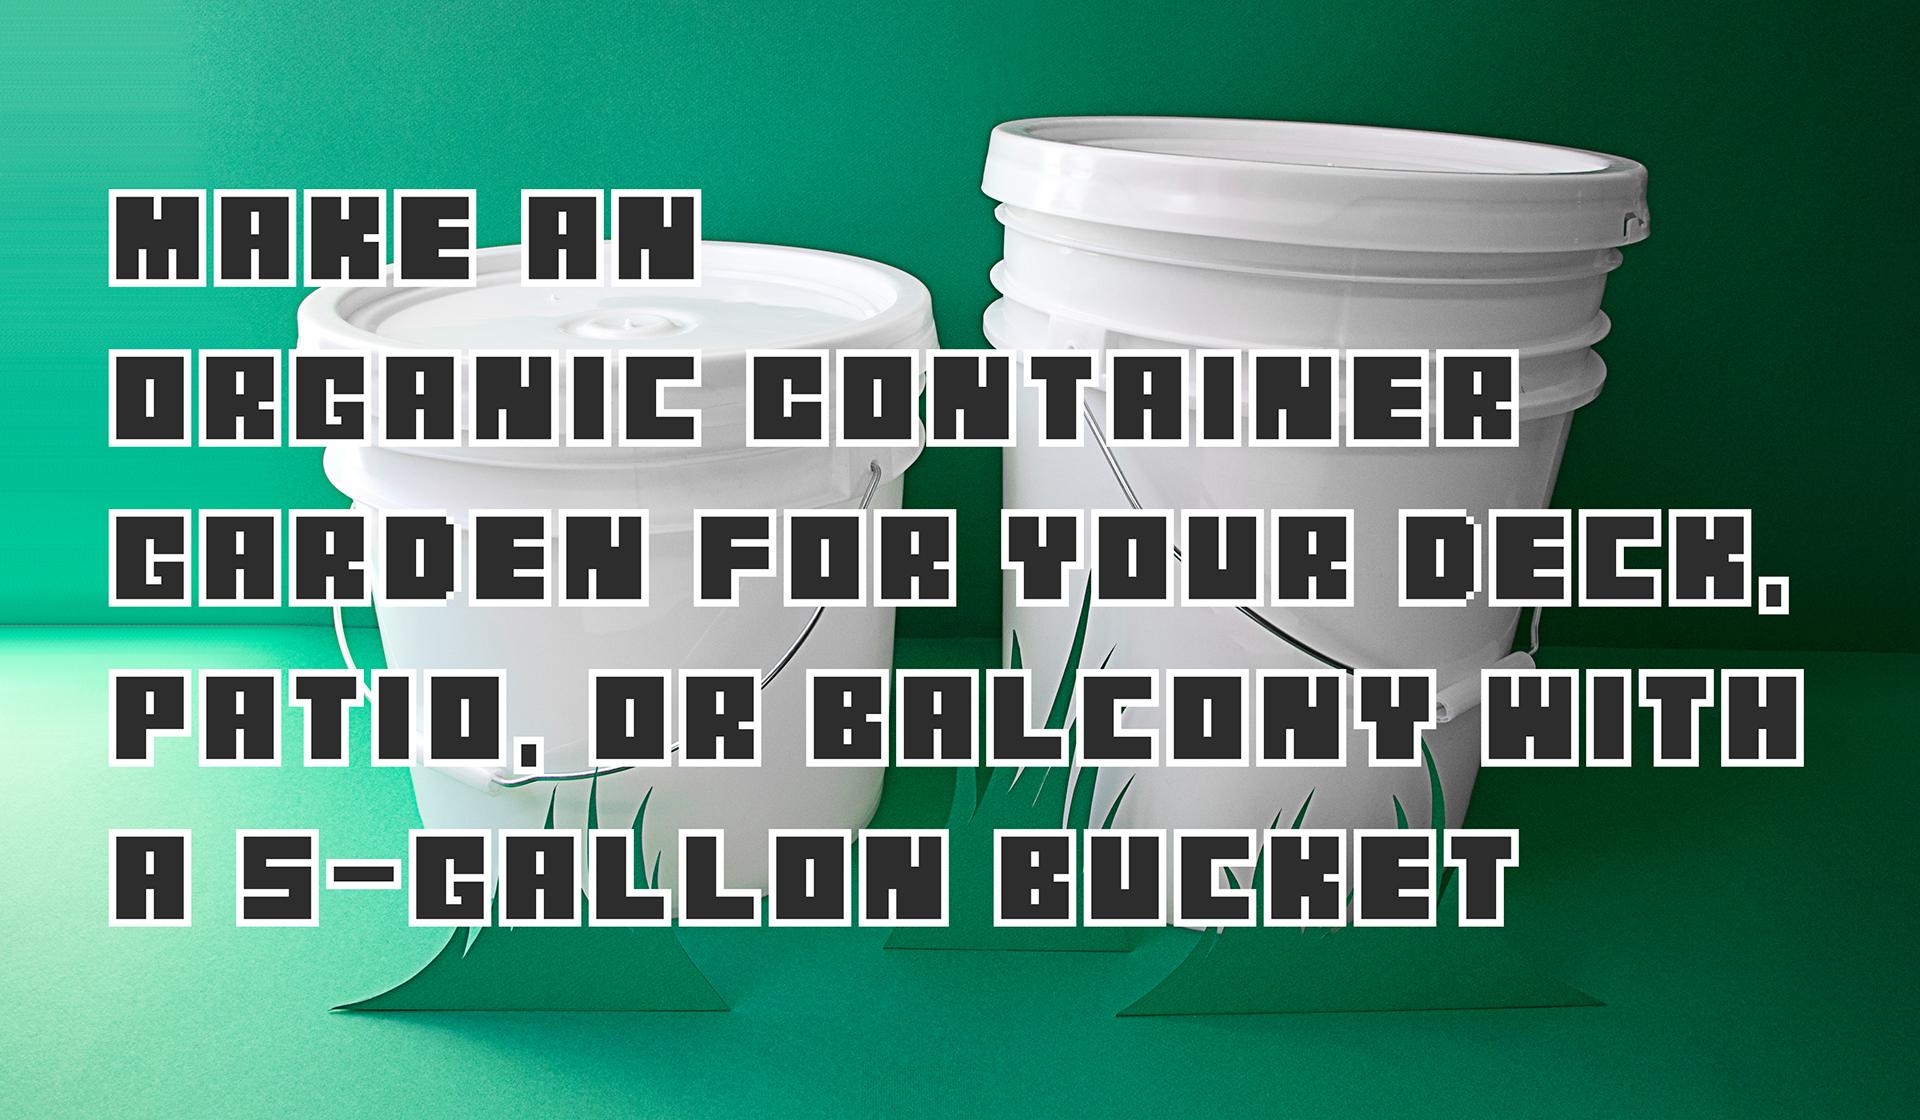 Make an Organic Container Garden for Your Deck, Patio, or Balcony With a 5-Gallon Bucket